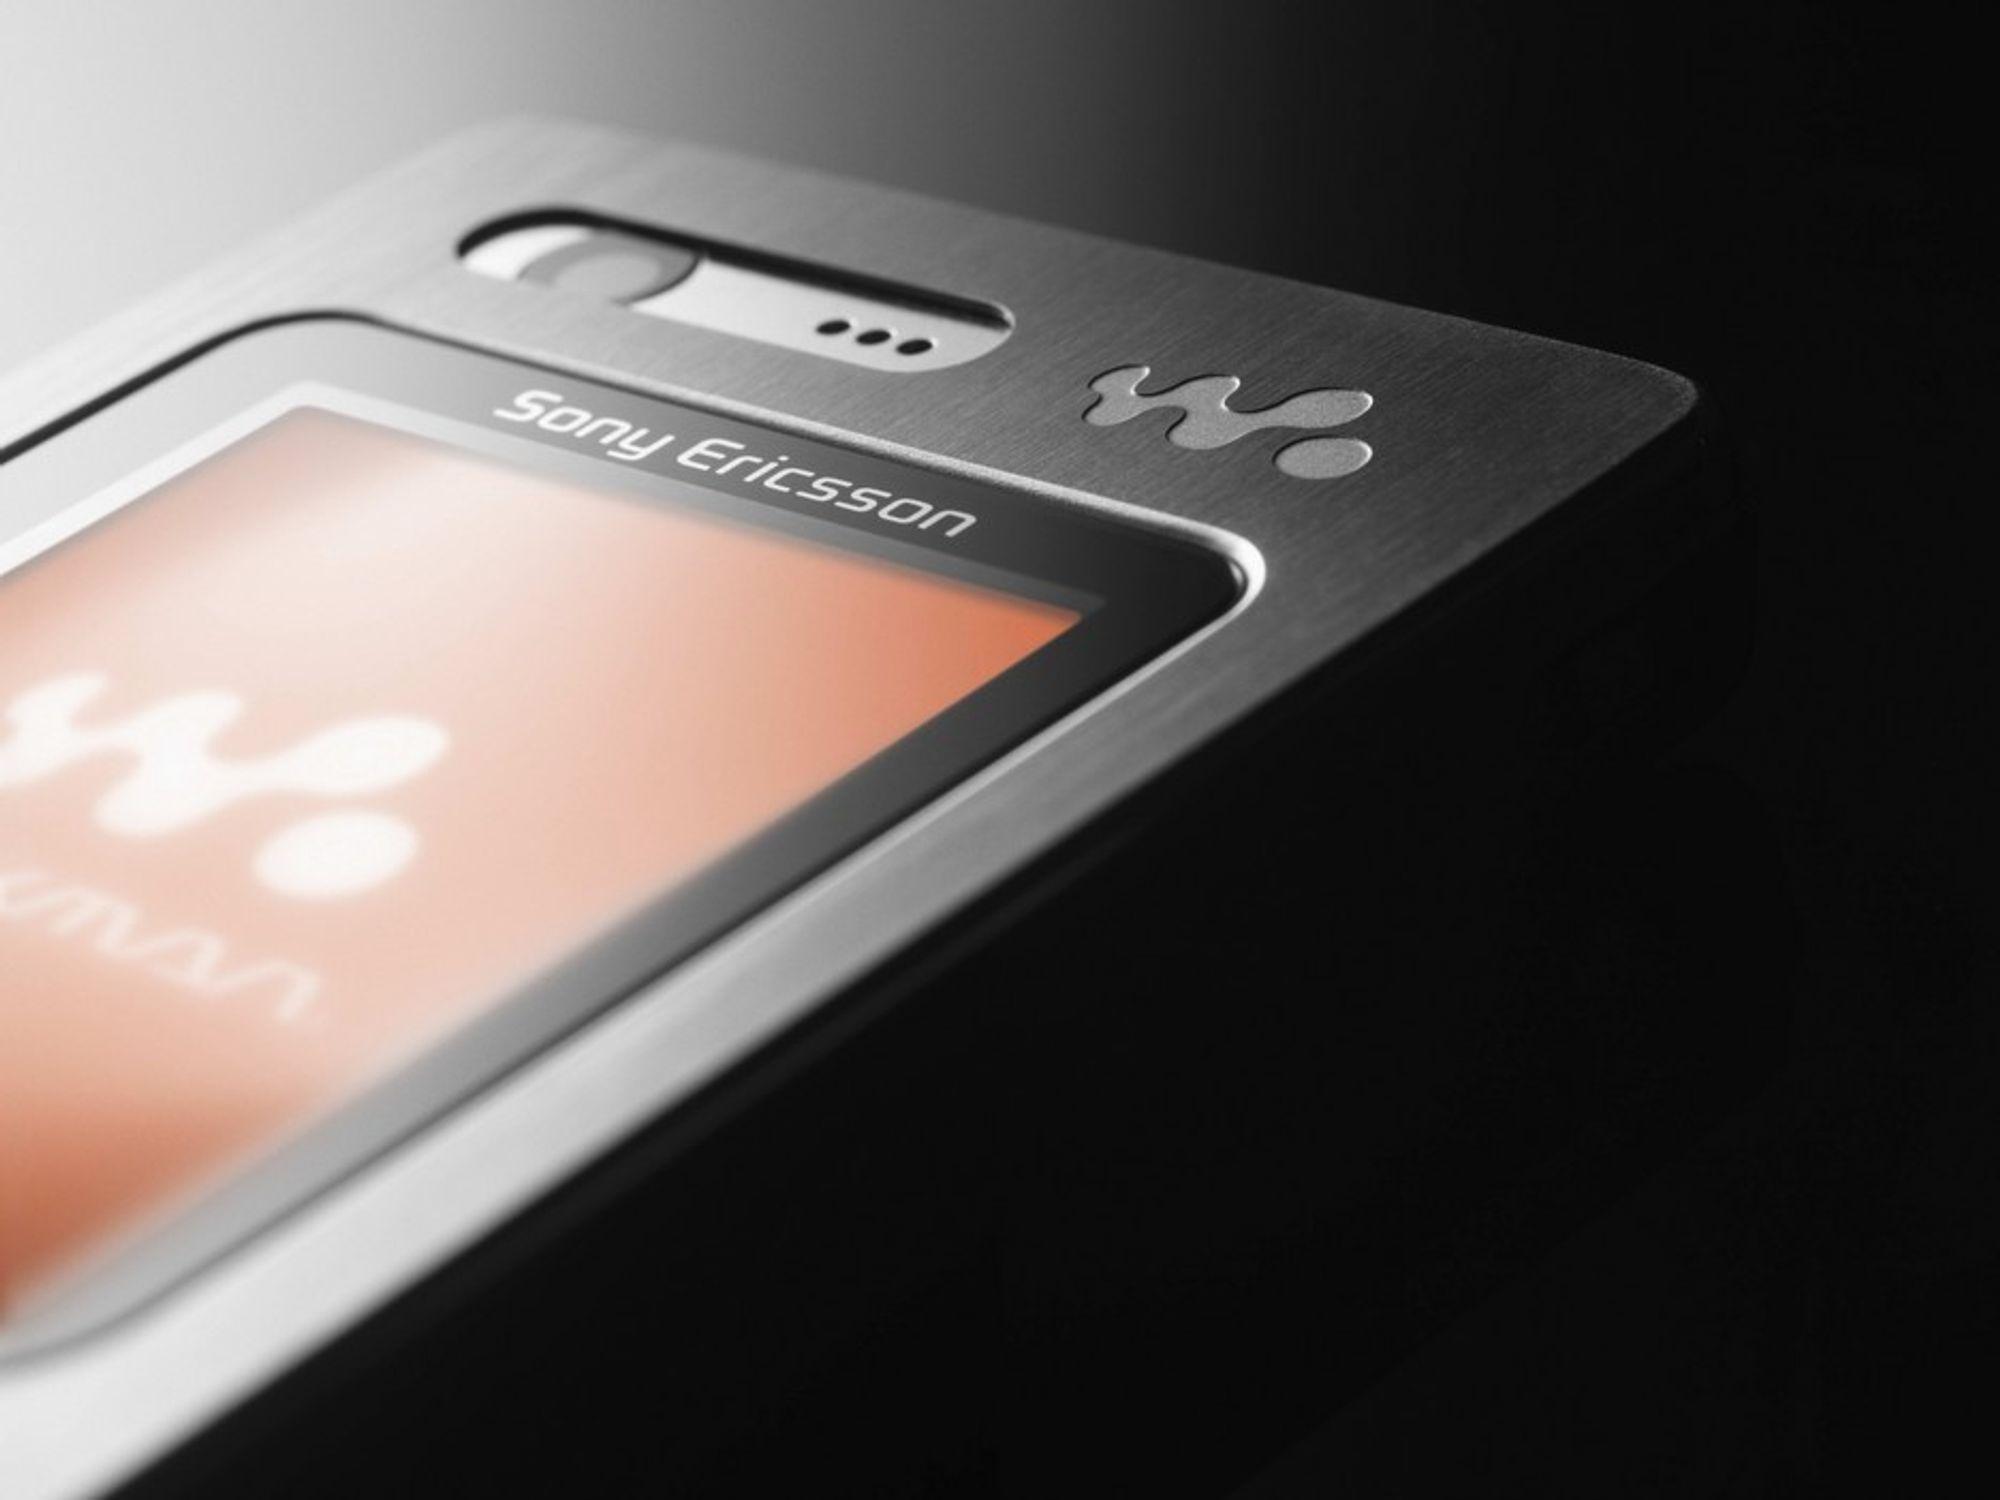 Sony Ericsson W880.